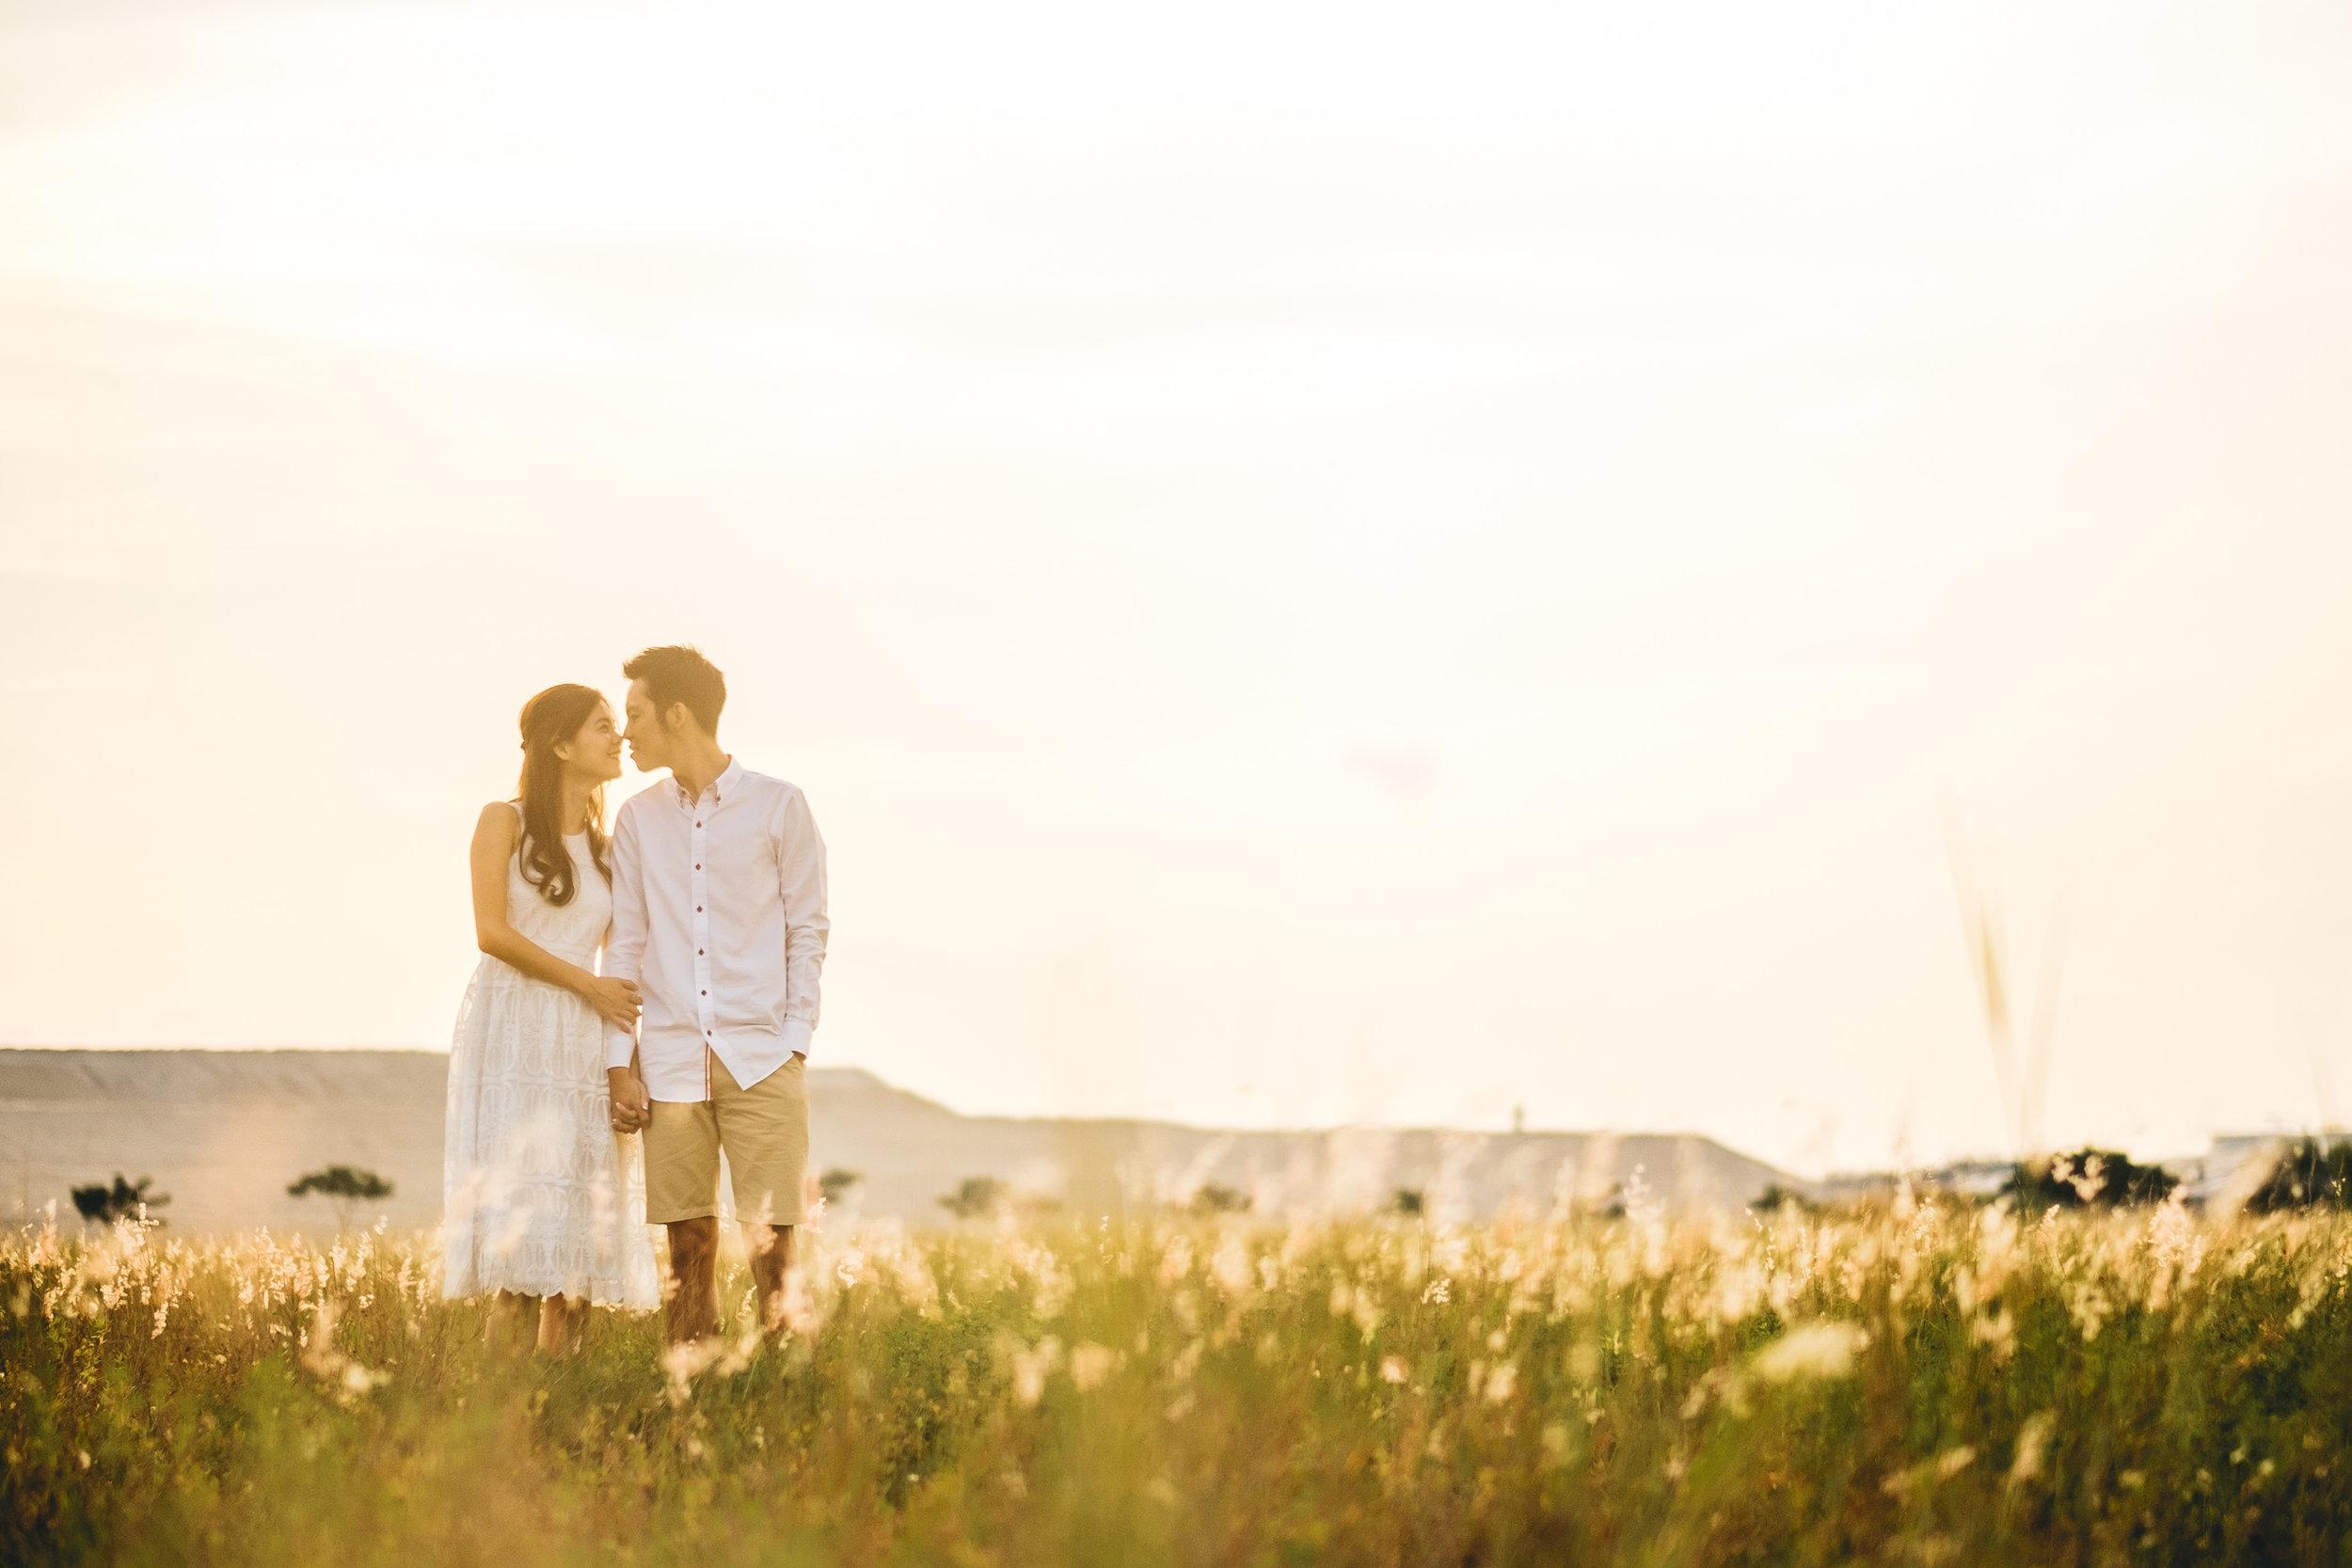 Juxtapose Pix - Pre-Wedding - Mark & Therese - Tuas Sunset 00001.jpg